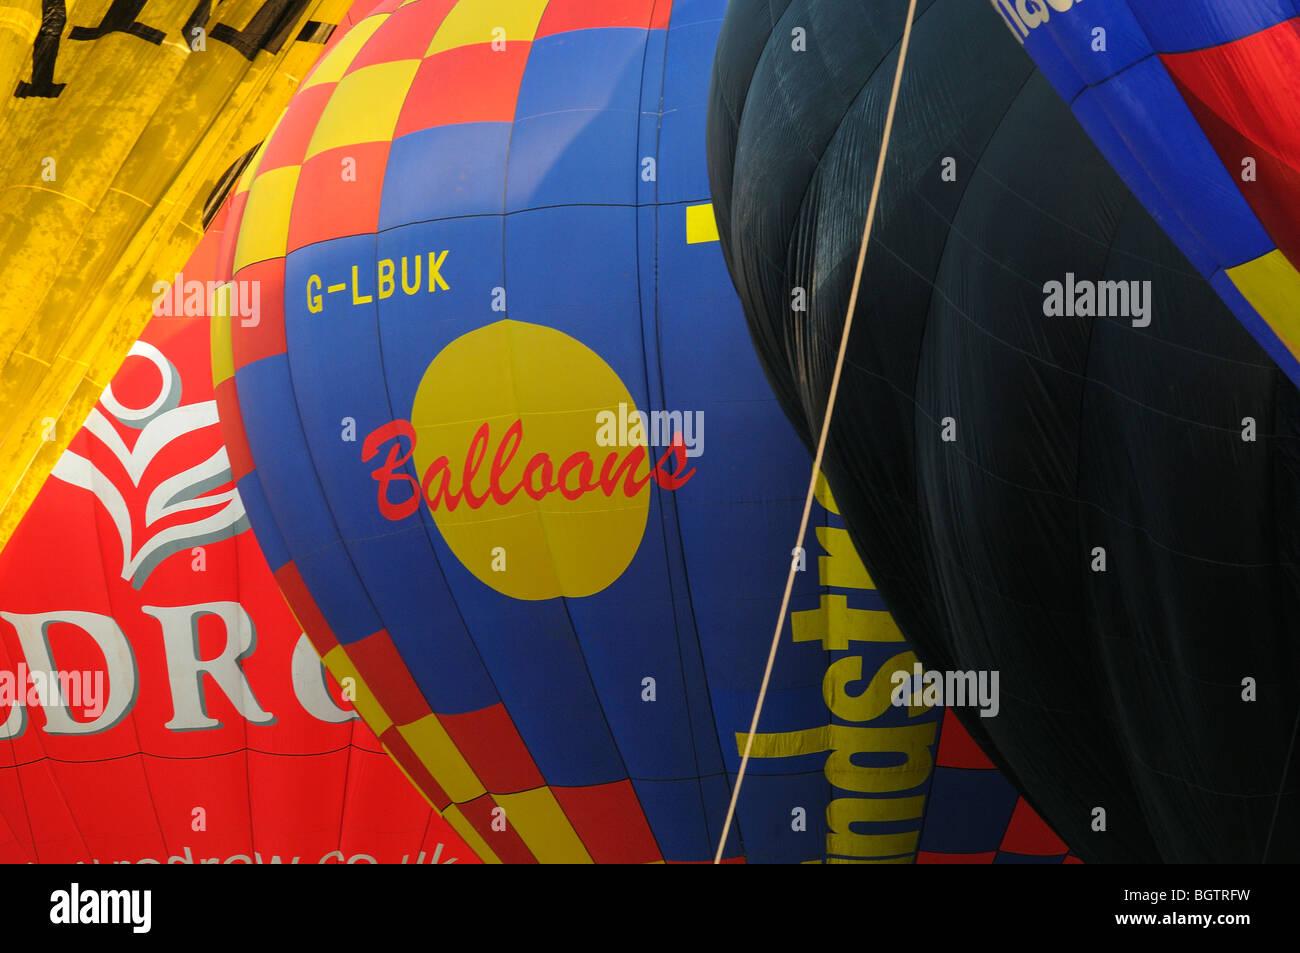 Hot Air Balloons, Bristol Festival 2009, UK. - Stock Image